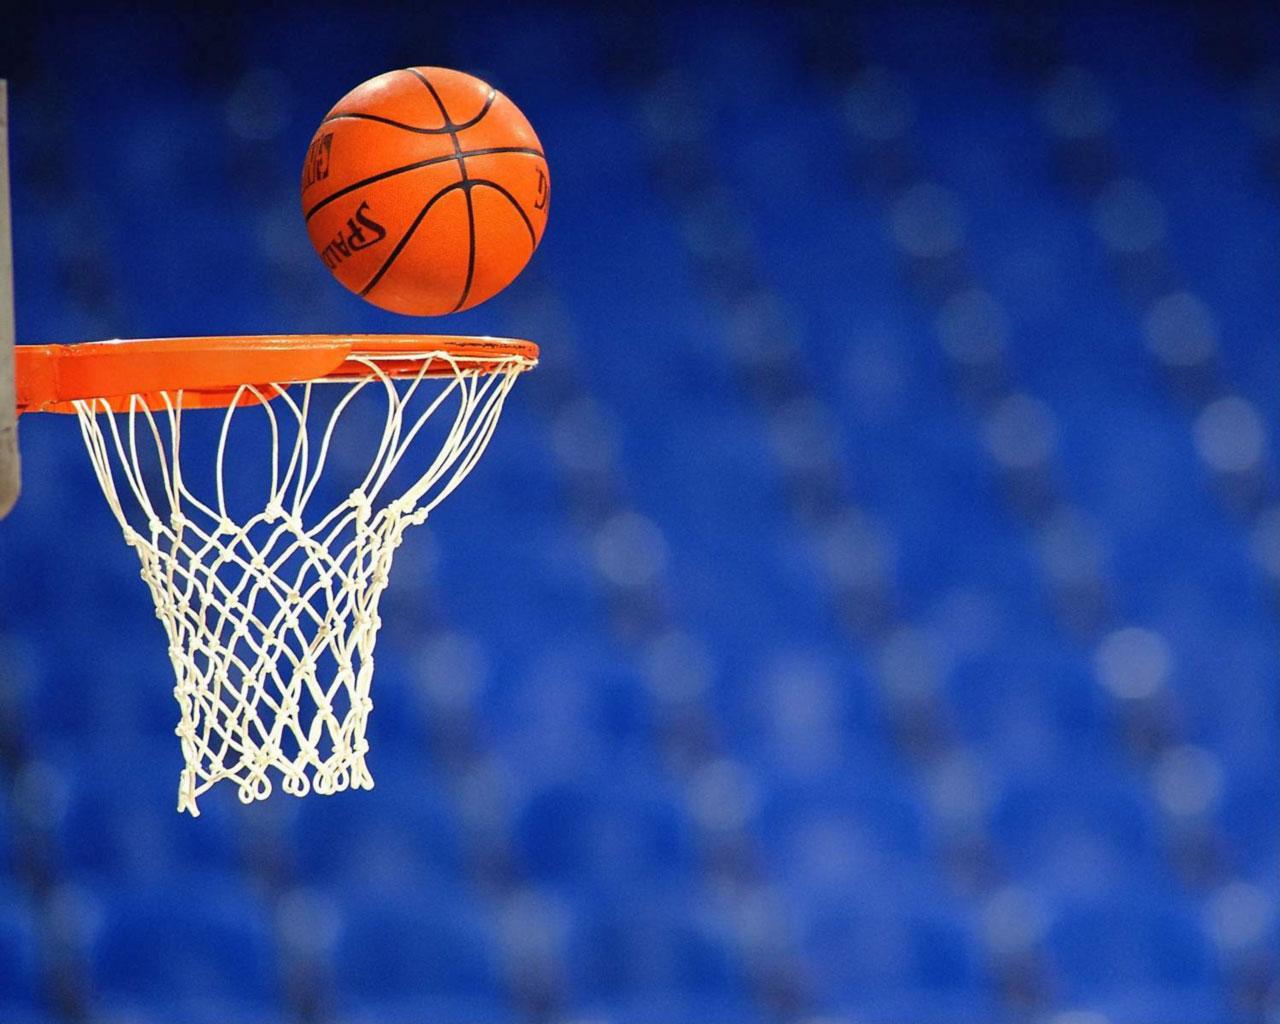 basketball wallpaper basketball wallpaper basketball wallpaper 1280x1024